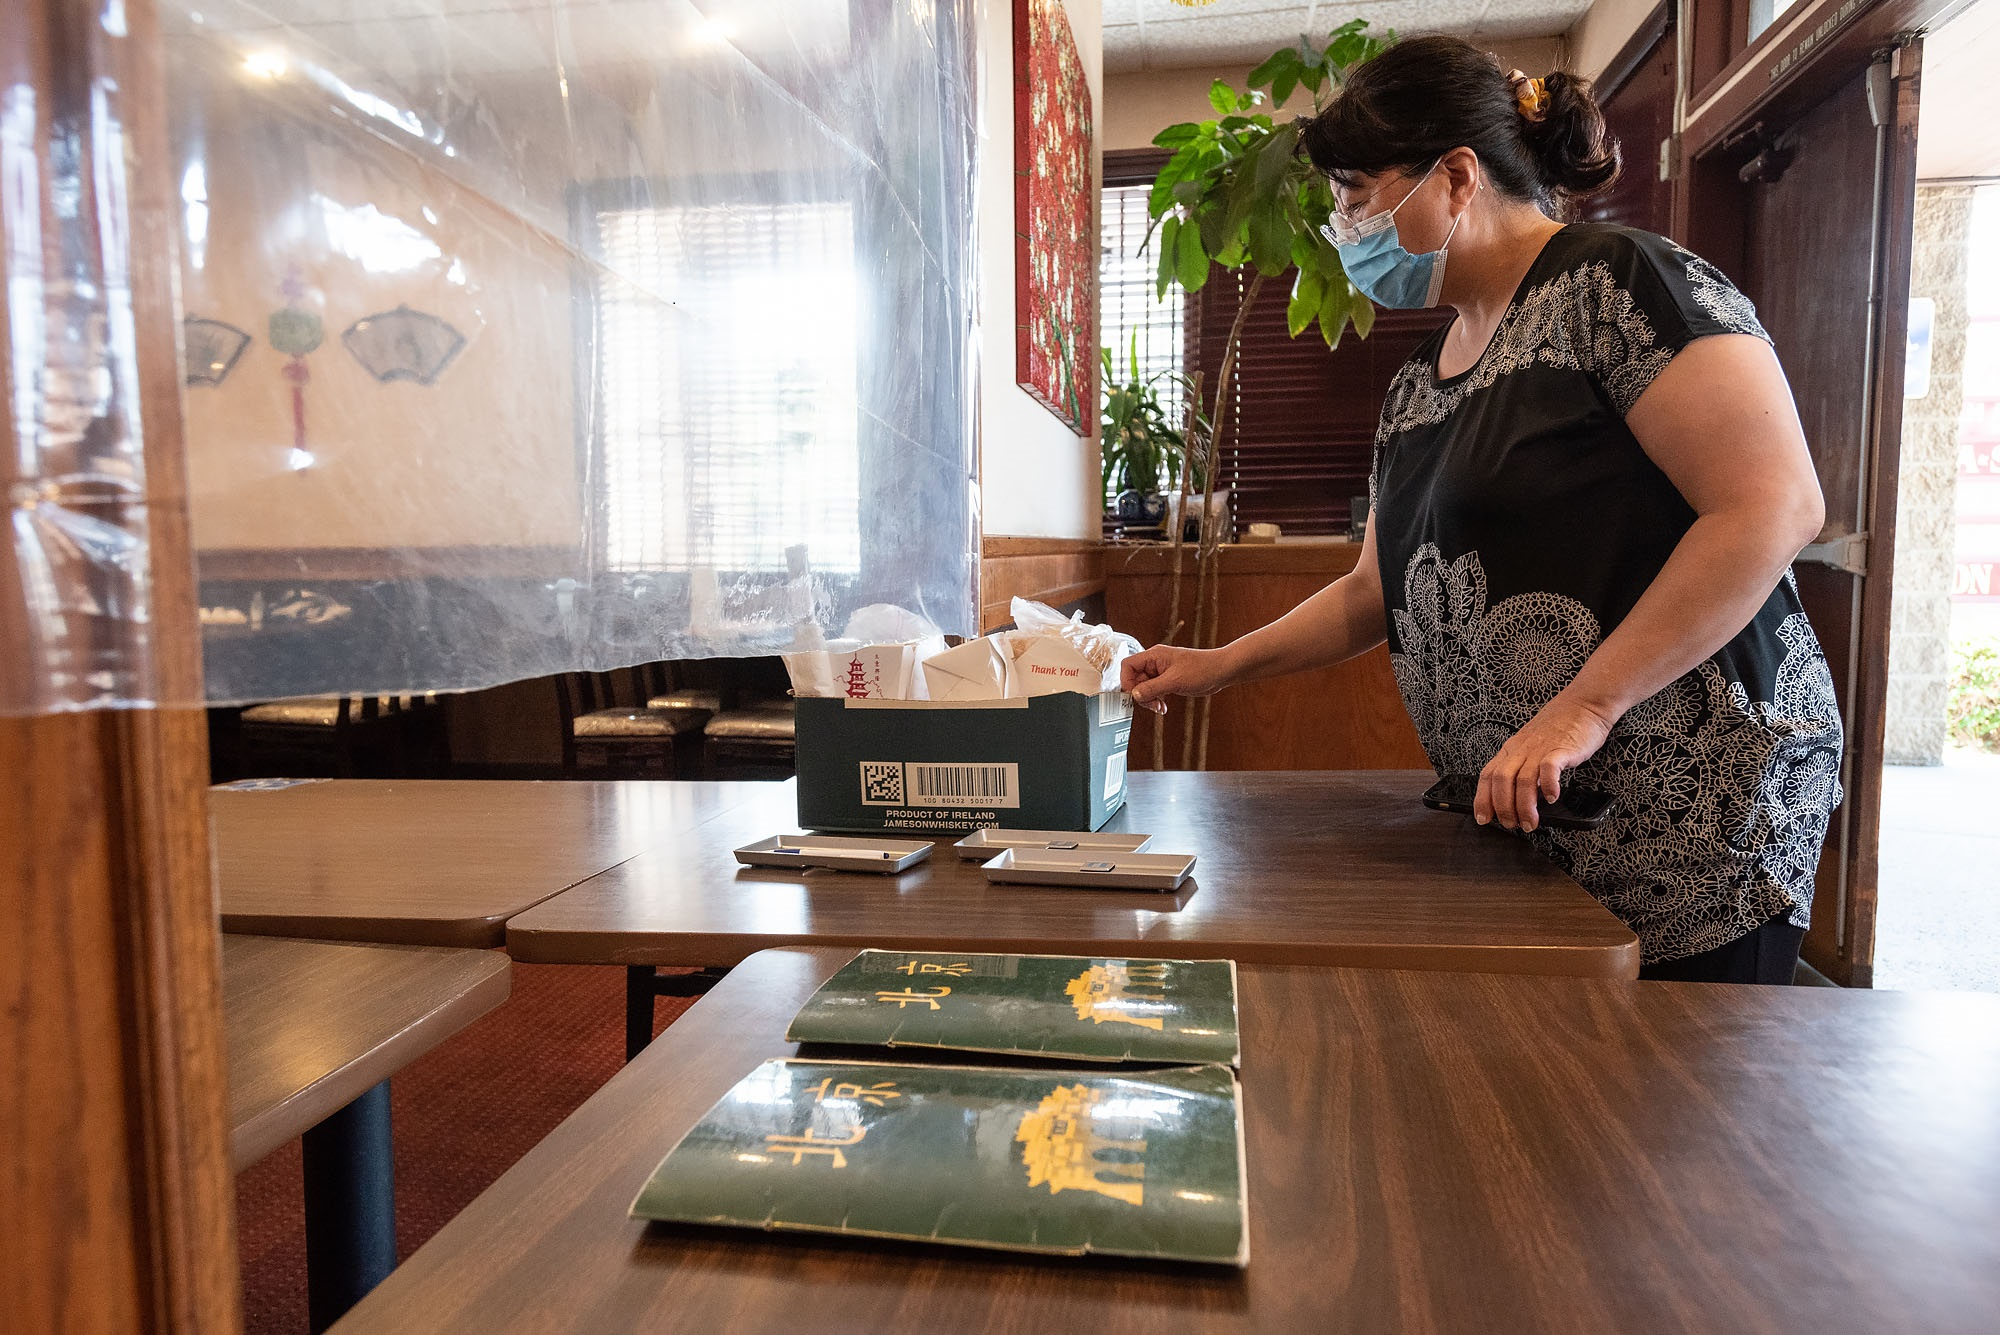 Customer picks up a takeout order at Peking Gourmet in Garden Grove's Koreatown